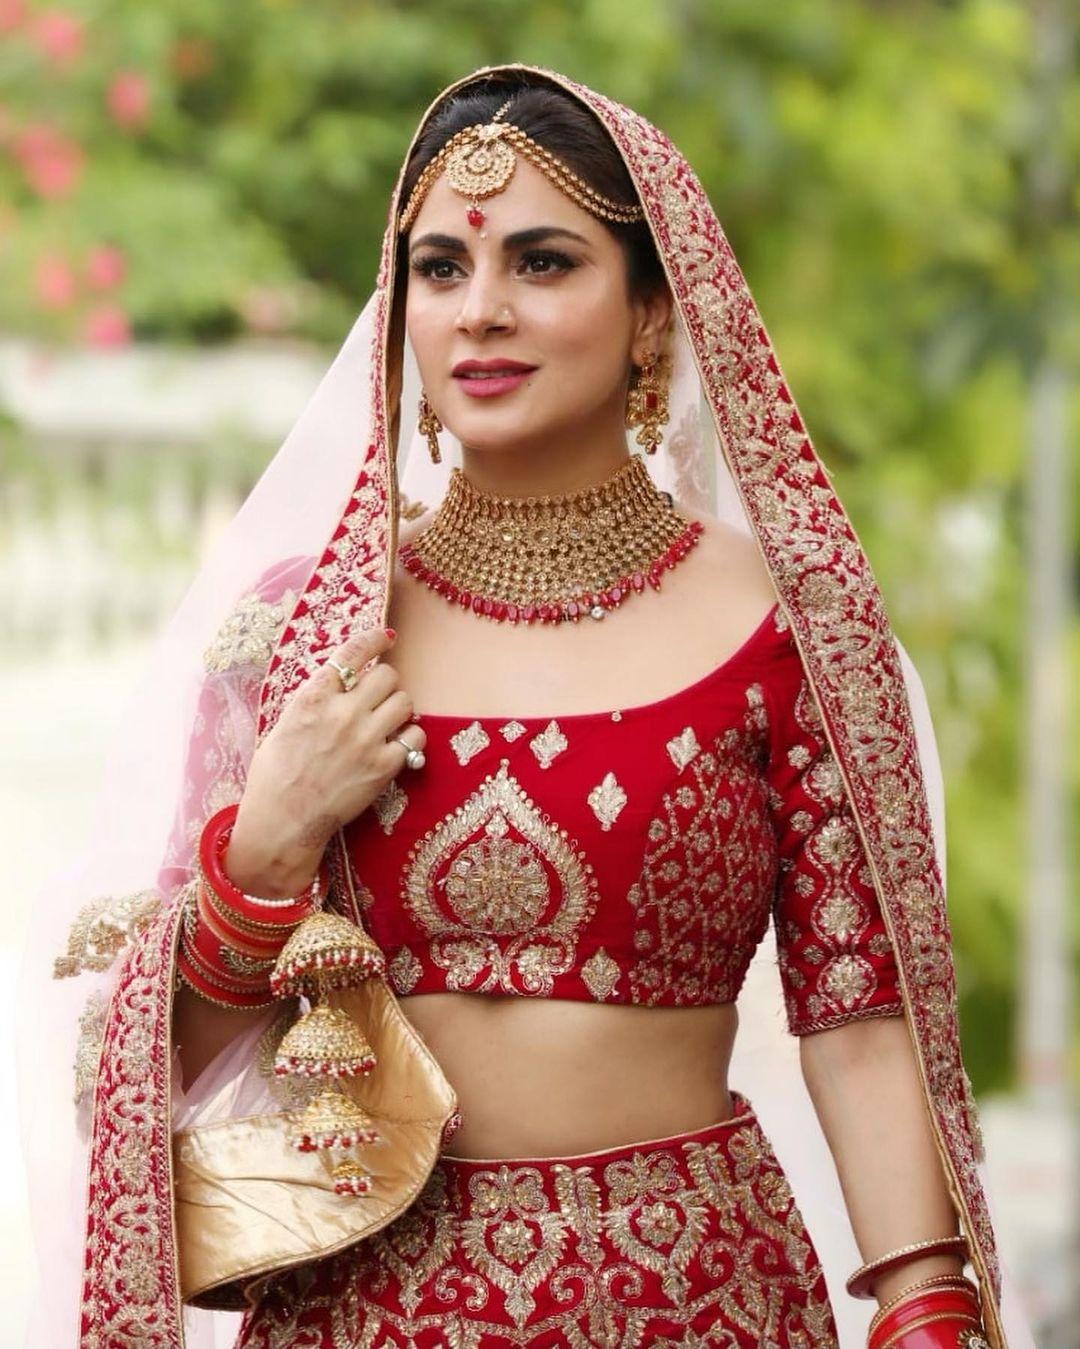 Shraddha Arya, Mouni Roy, And Kaveri Priyam's Bridal Outfit Goals